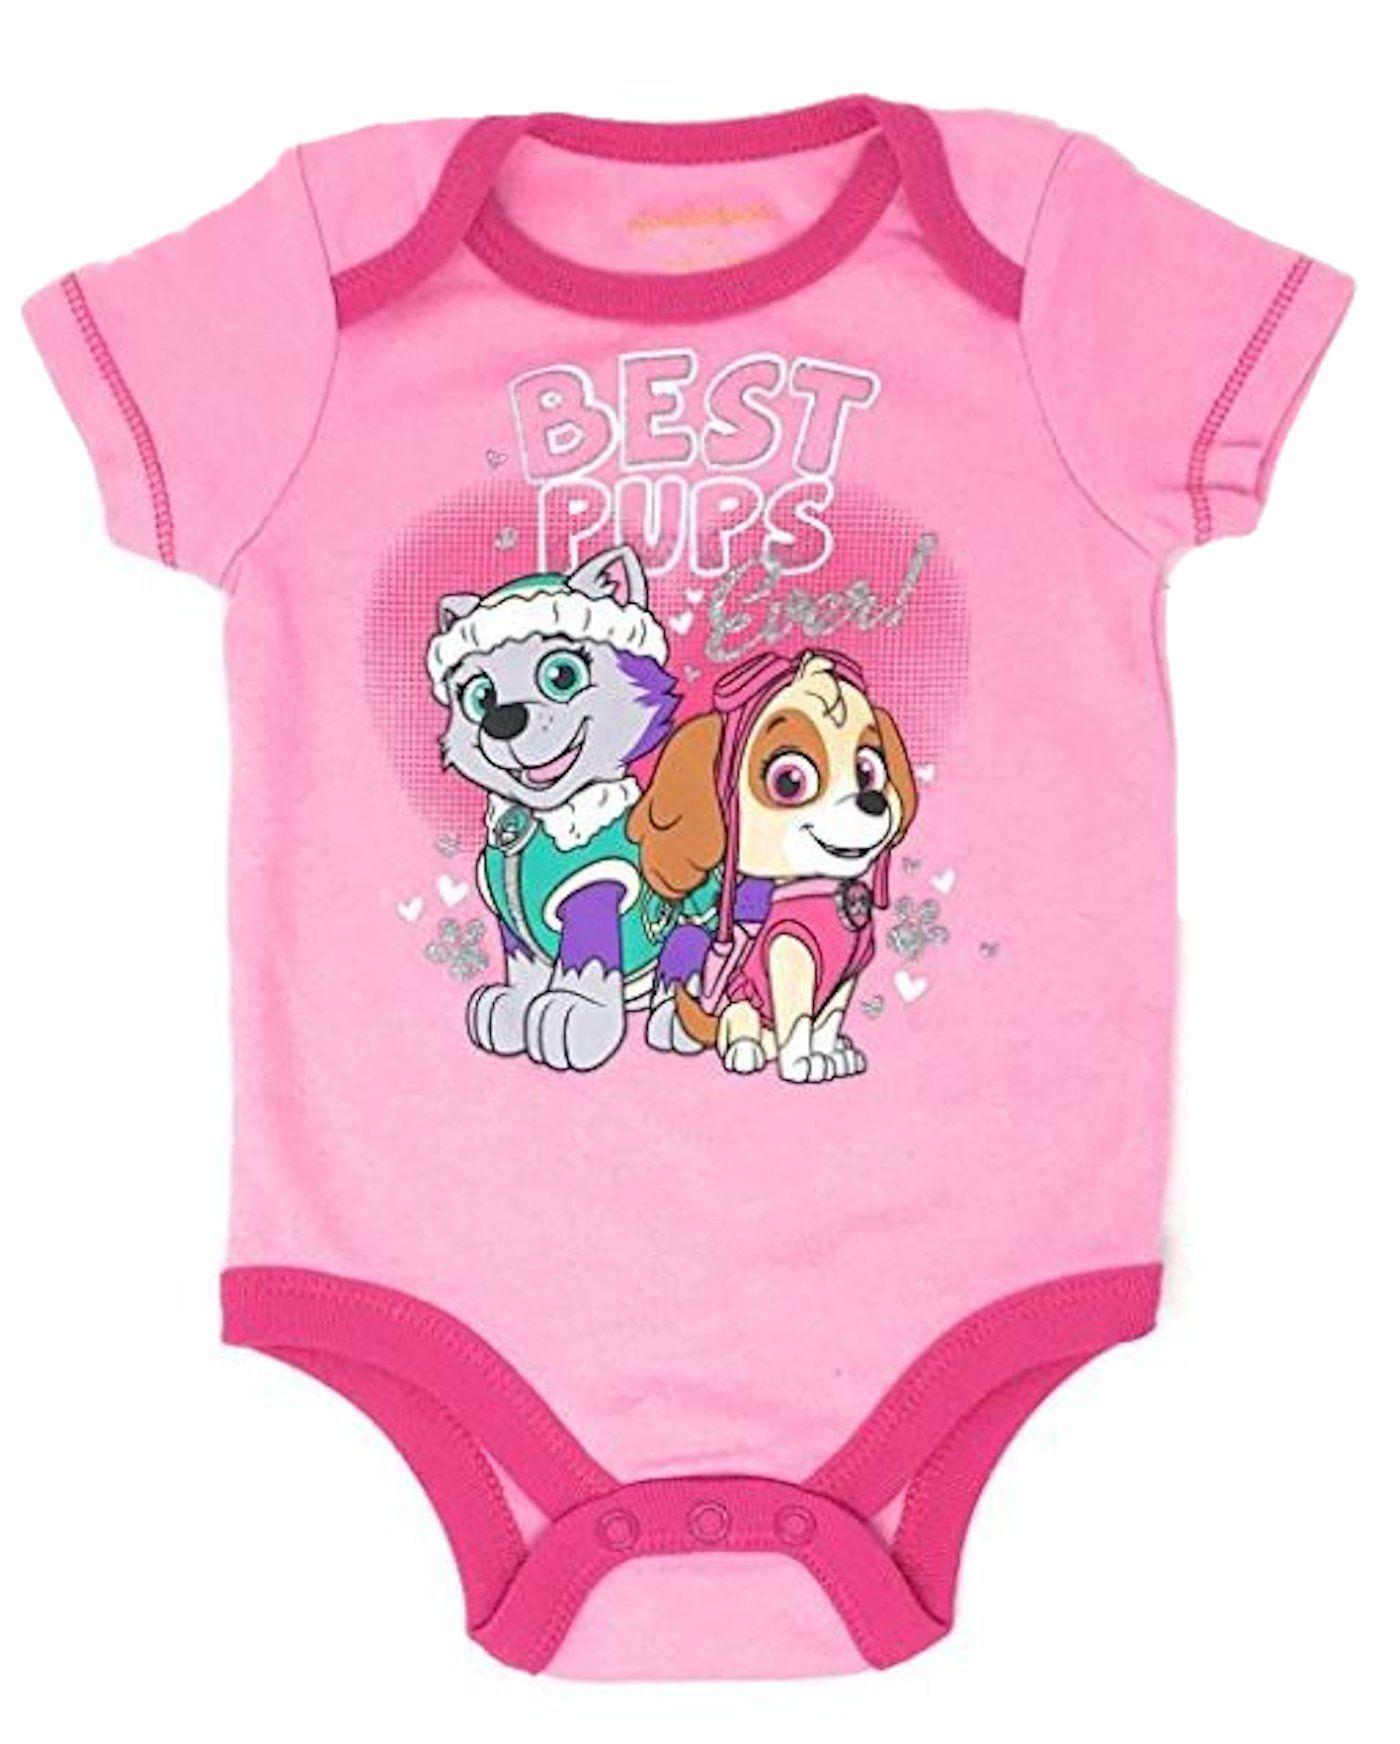 Paw Patrol Baby Infant Romper Bodysuit 0-3 Months NEW